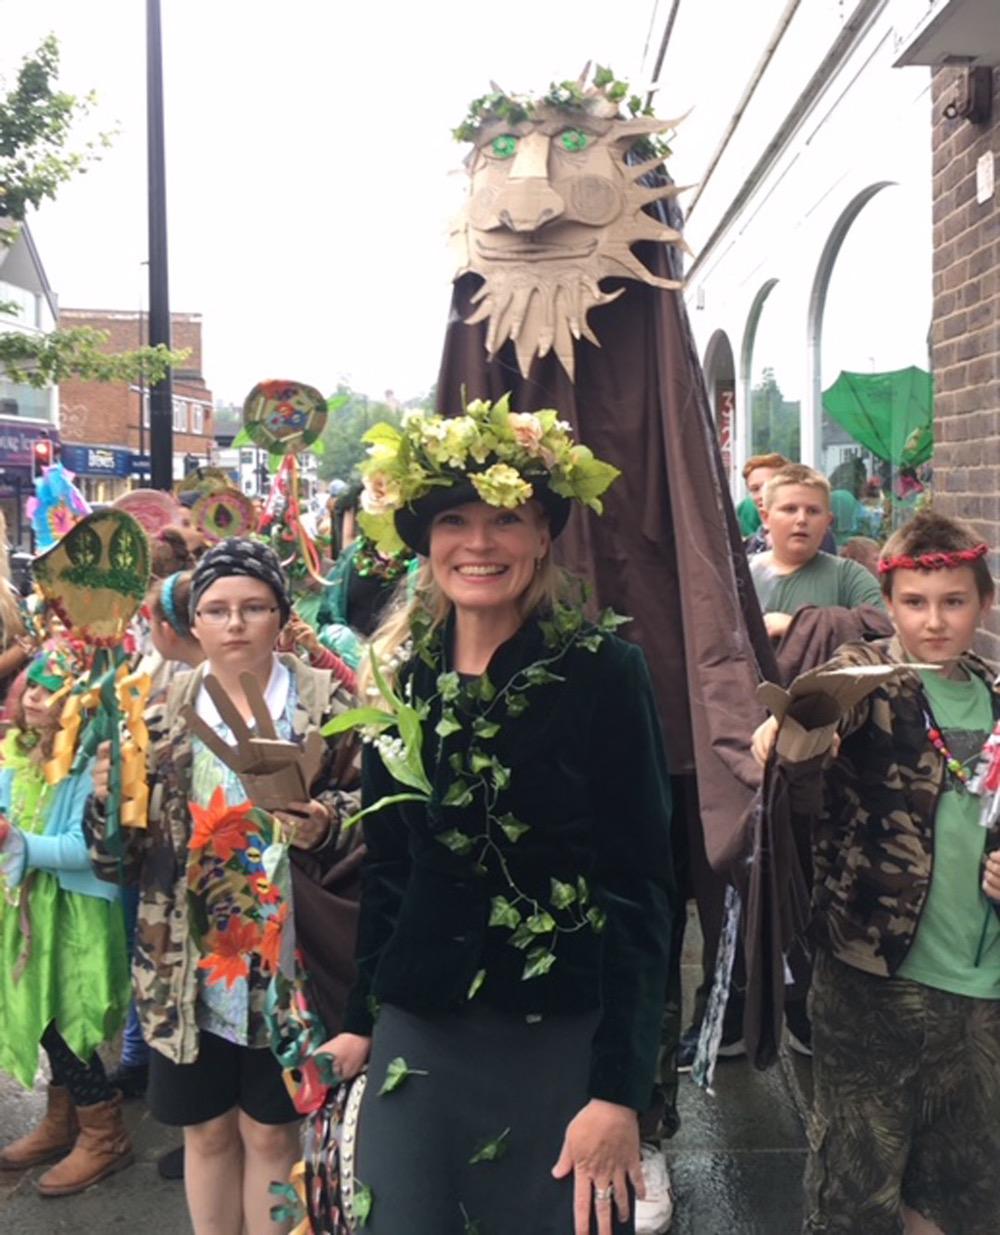 holy-cross-summer-parade-mrs-dart-wood-giant